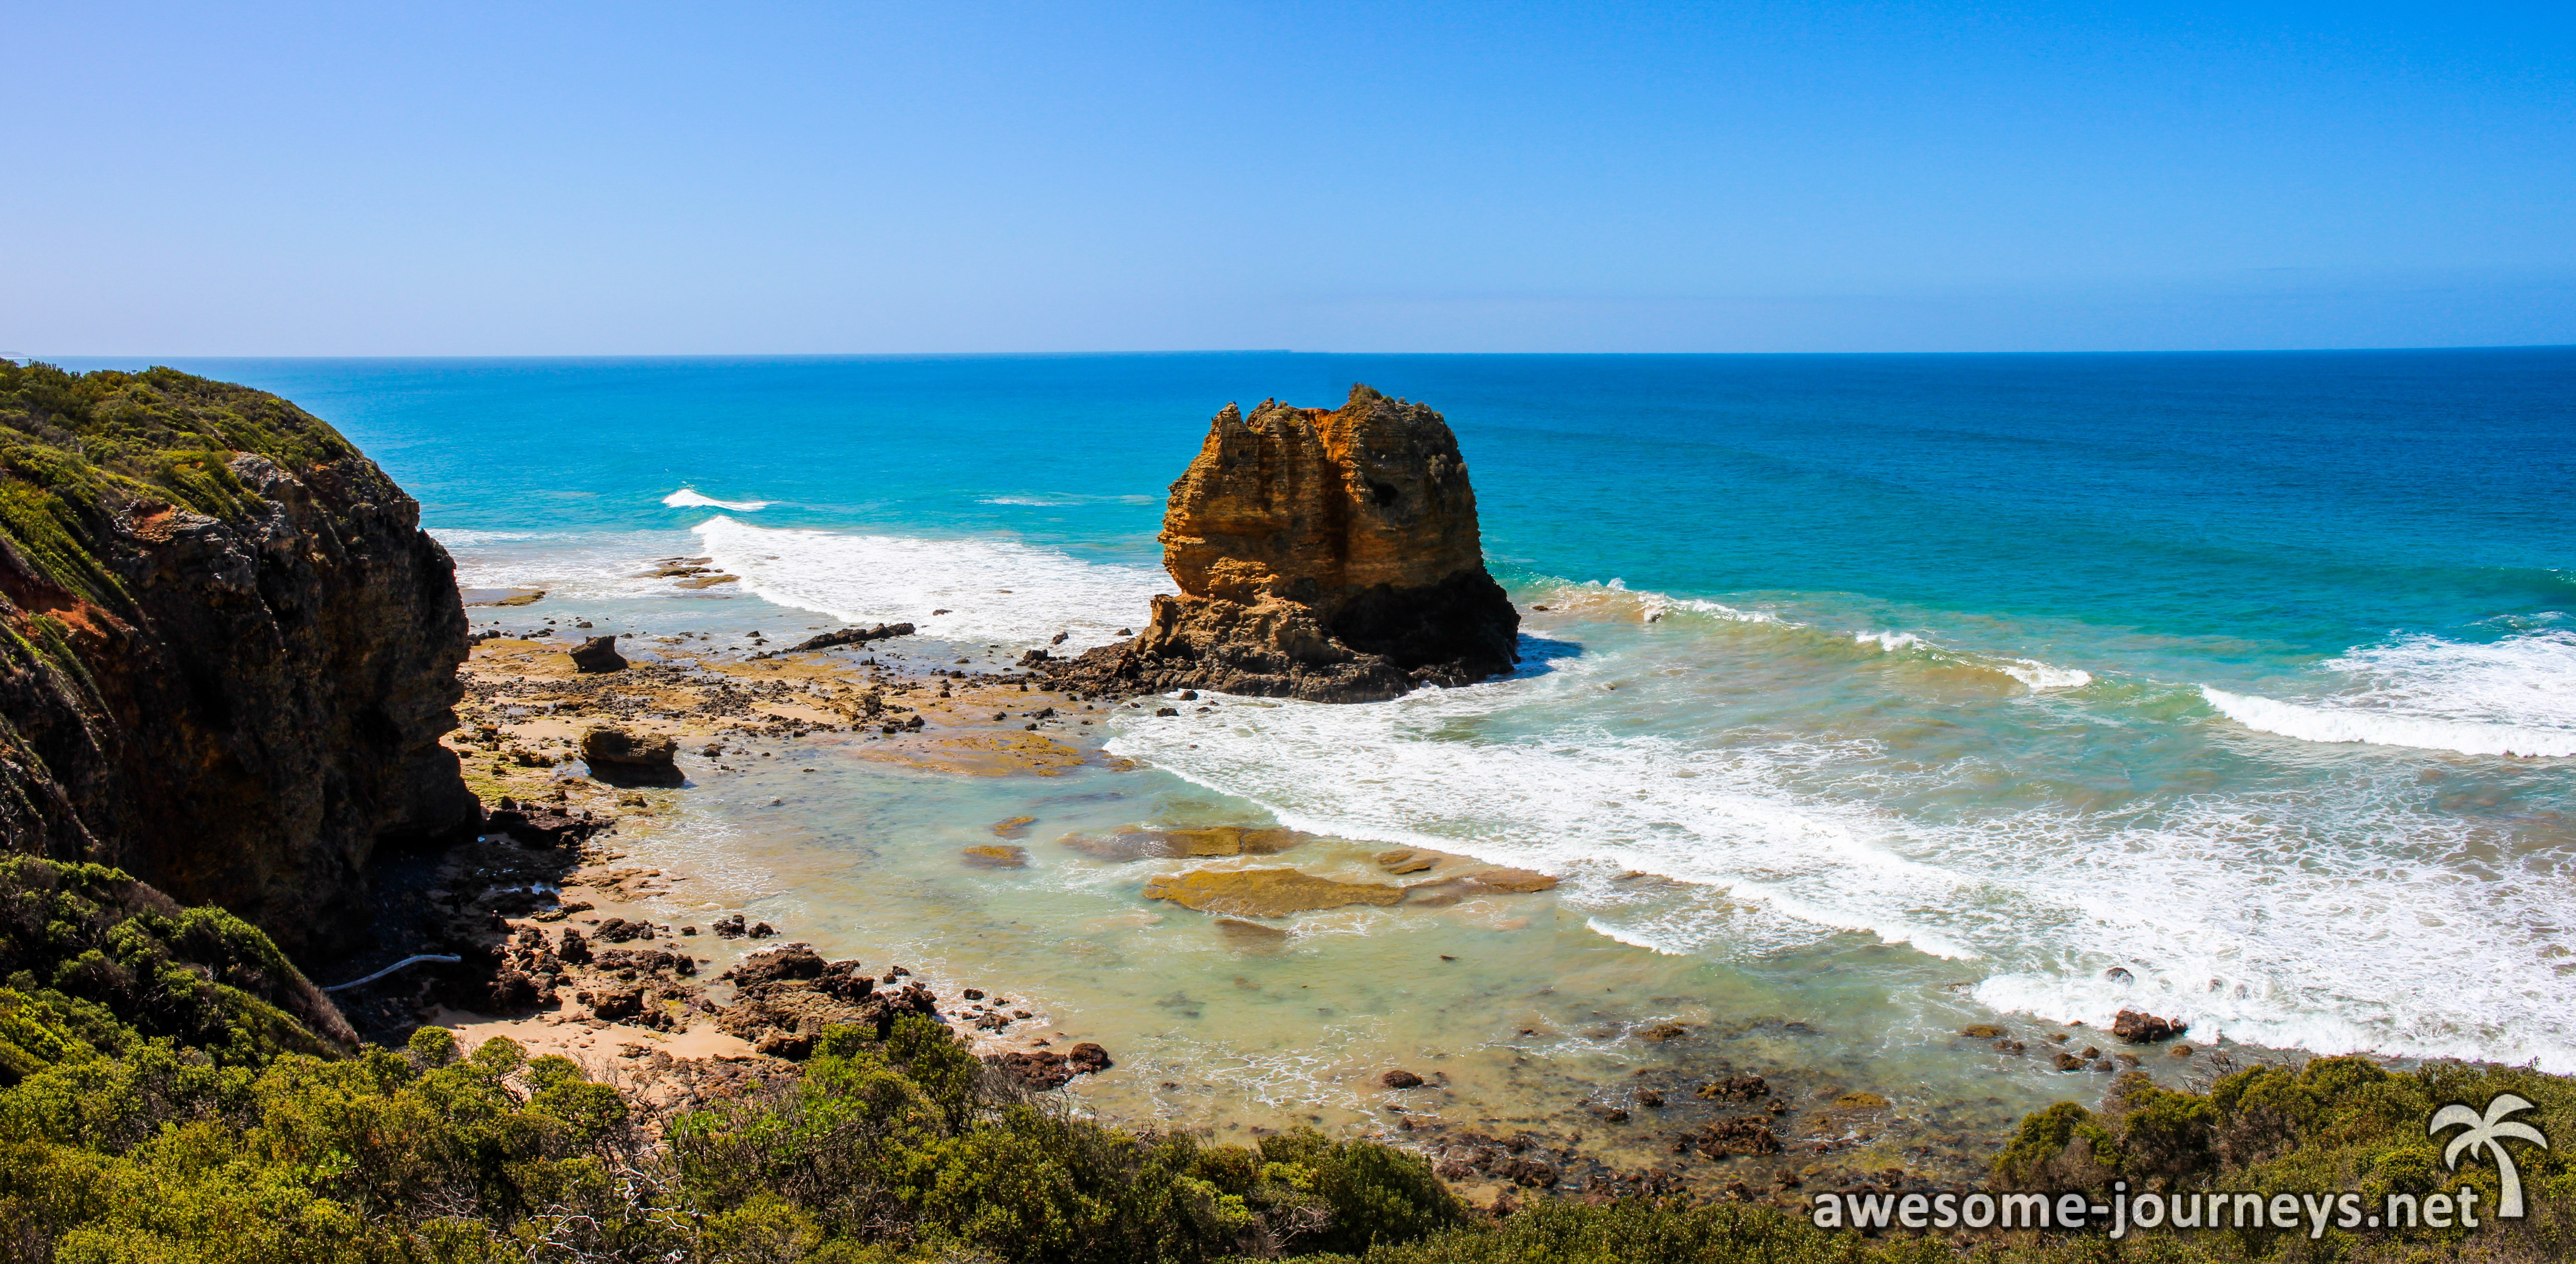 australien_great_ocean_road_splitpointlighthouse_2